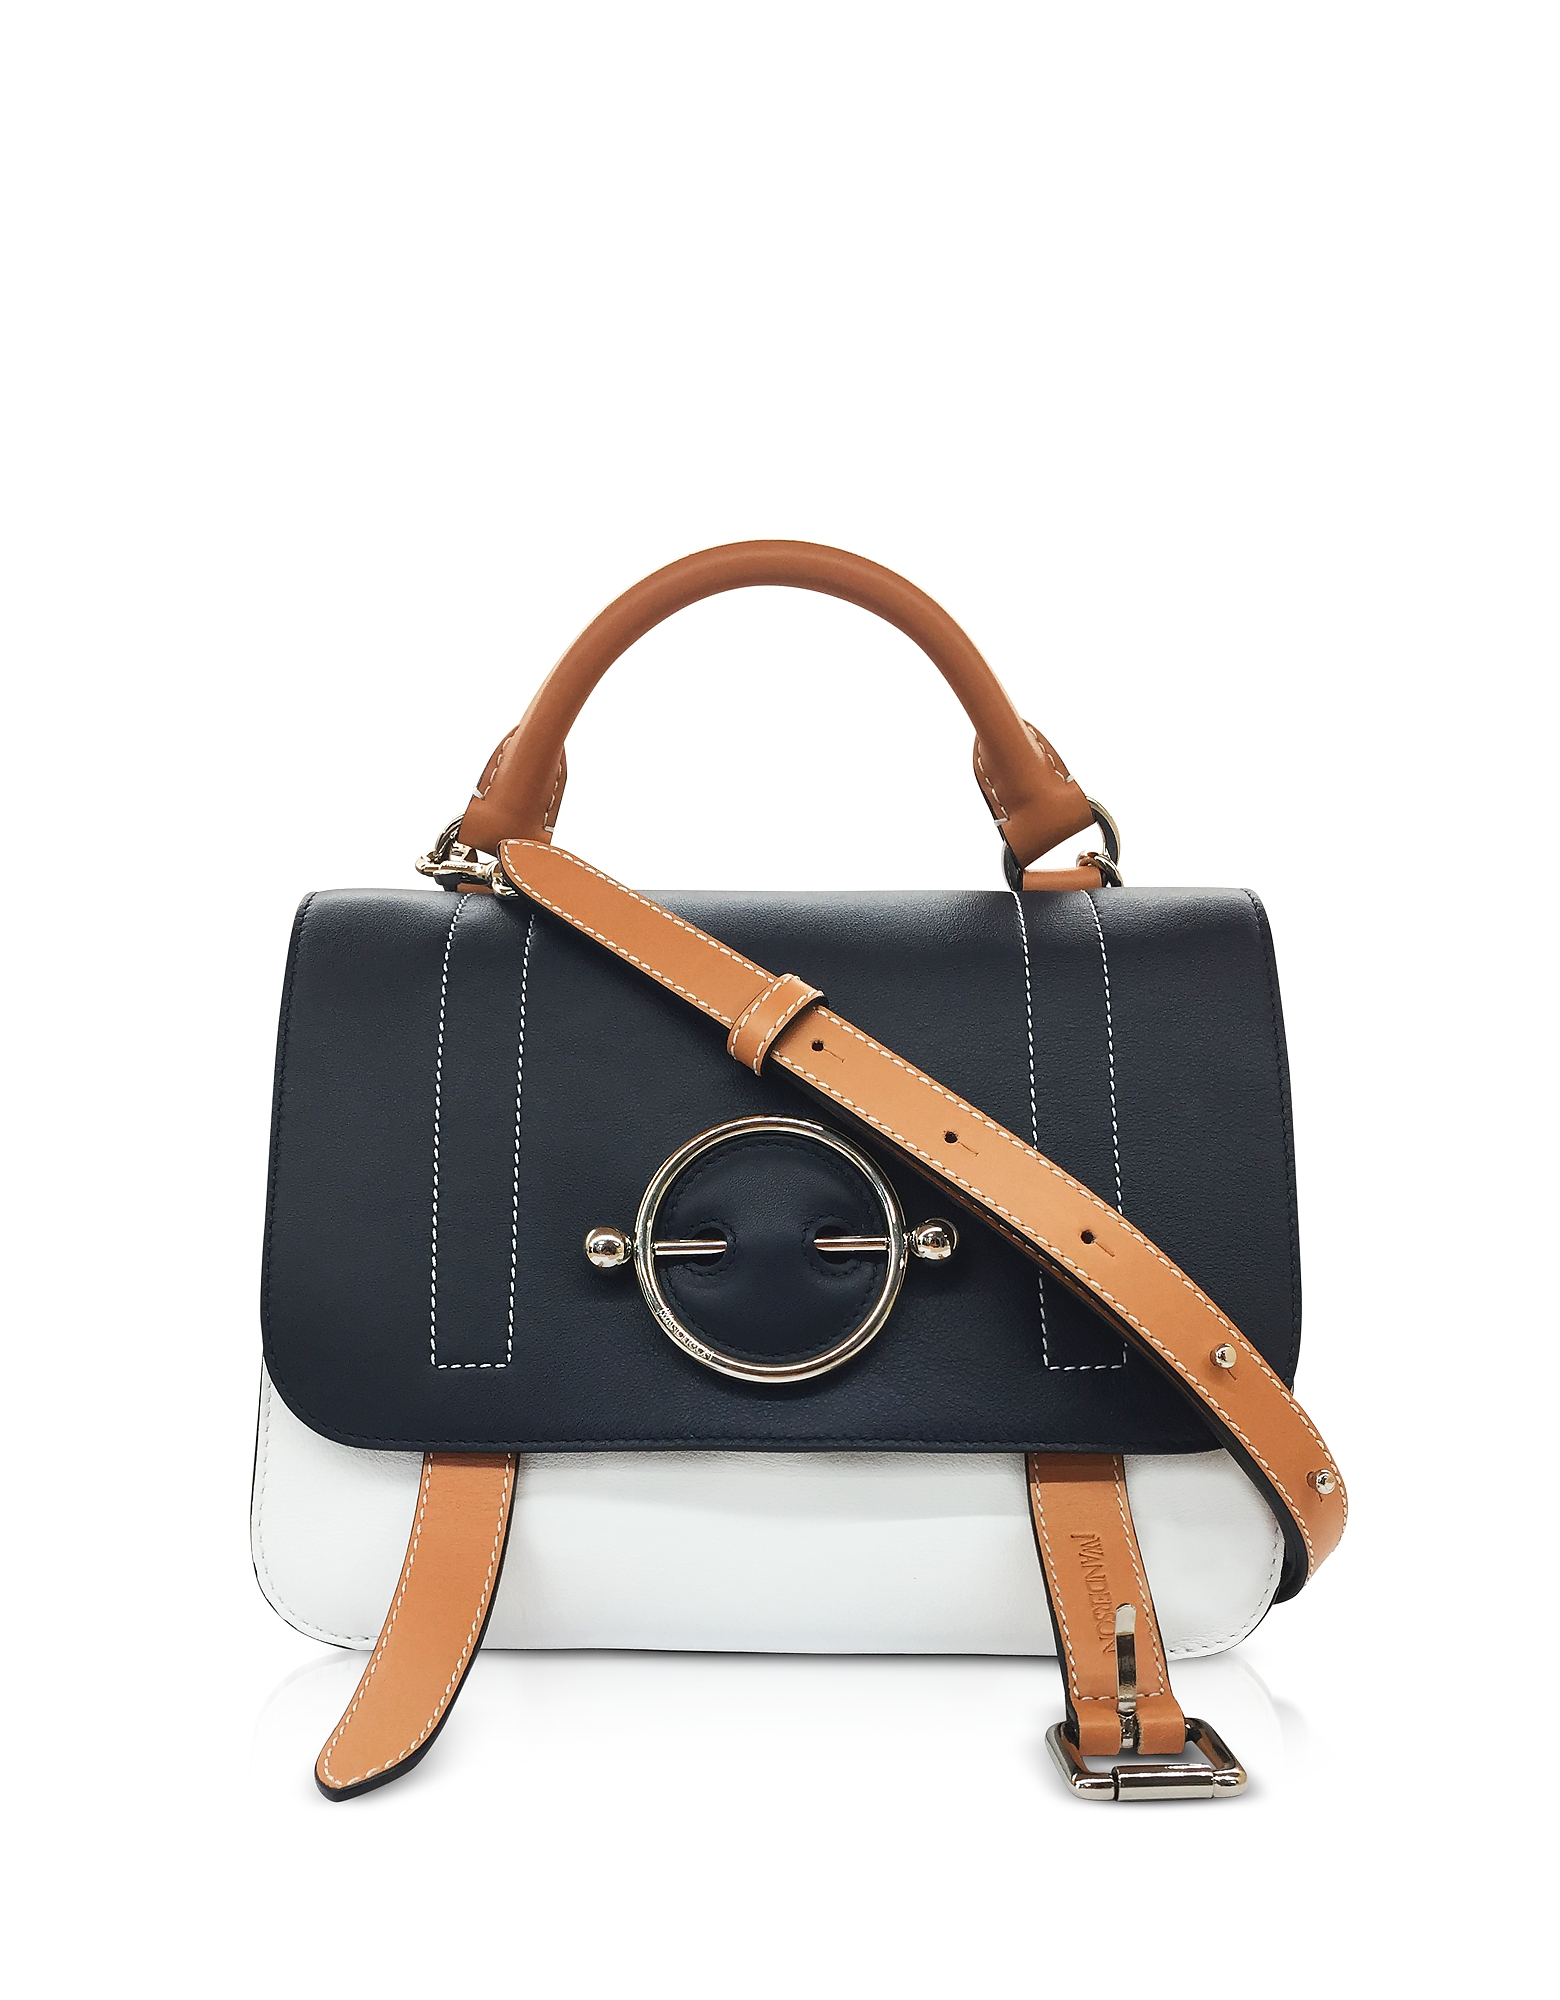 JW Anderson Handbags, Ocean Disc Satchel Bag